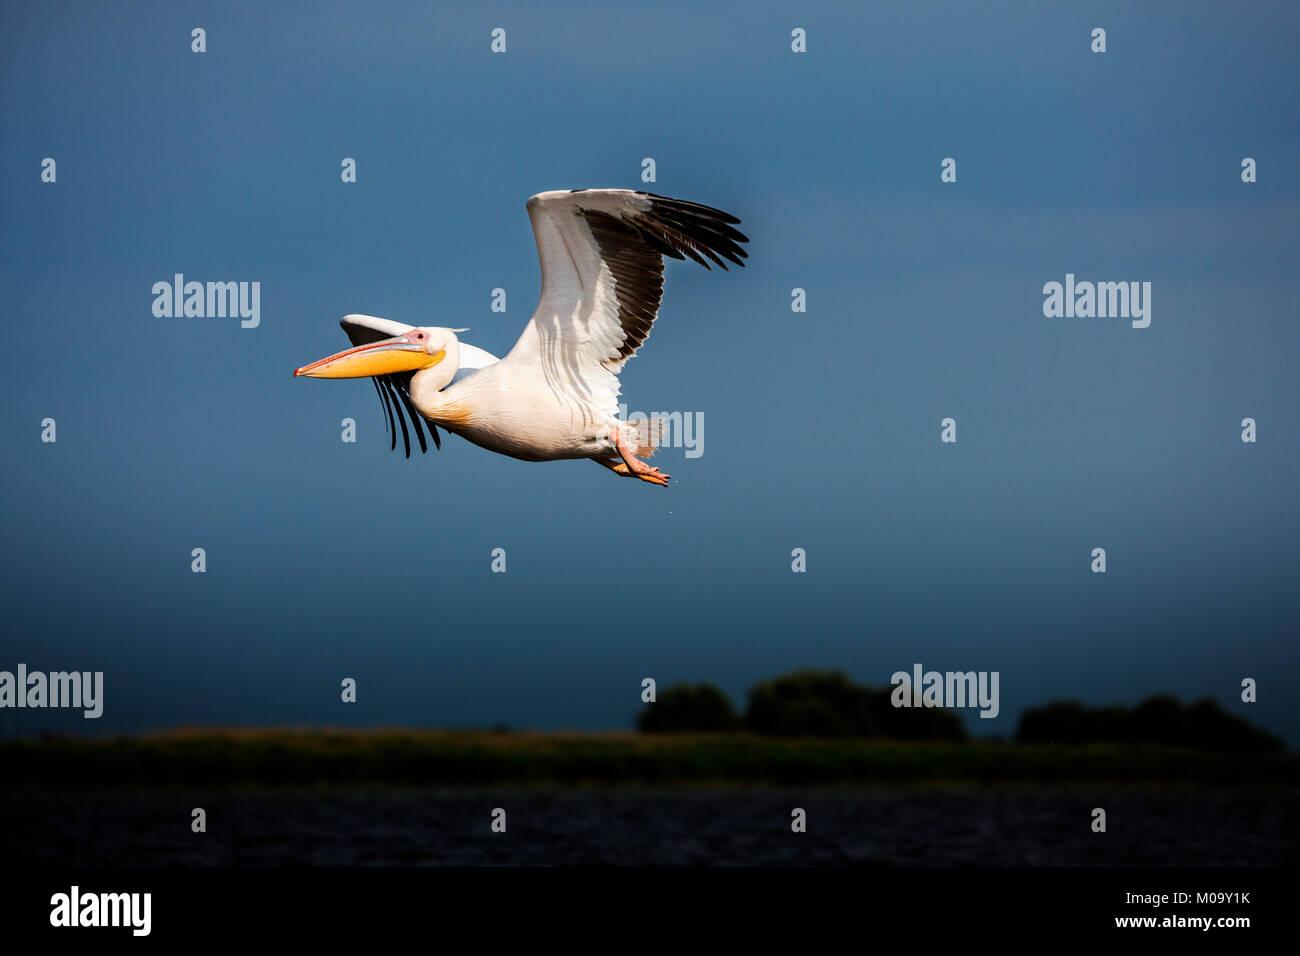 A flying pelican in the danube delta in Romania. Stock Photo